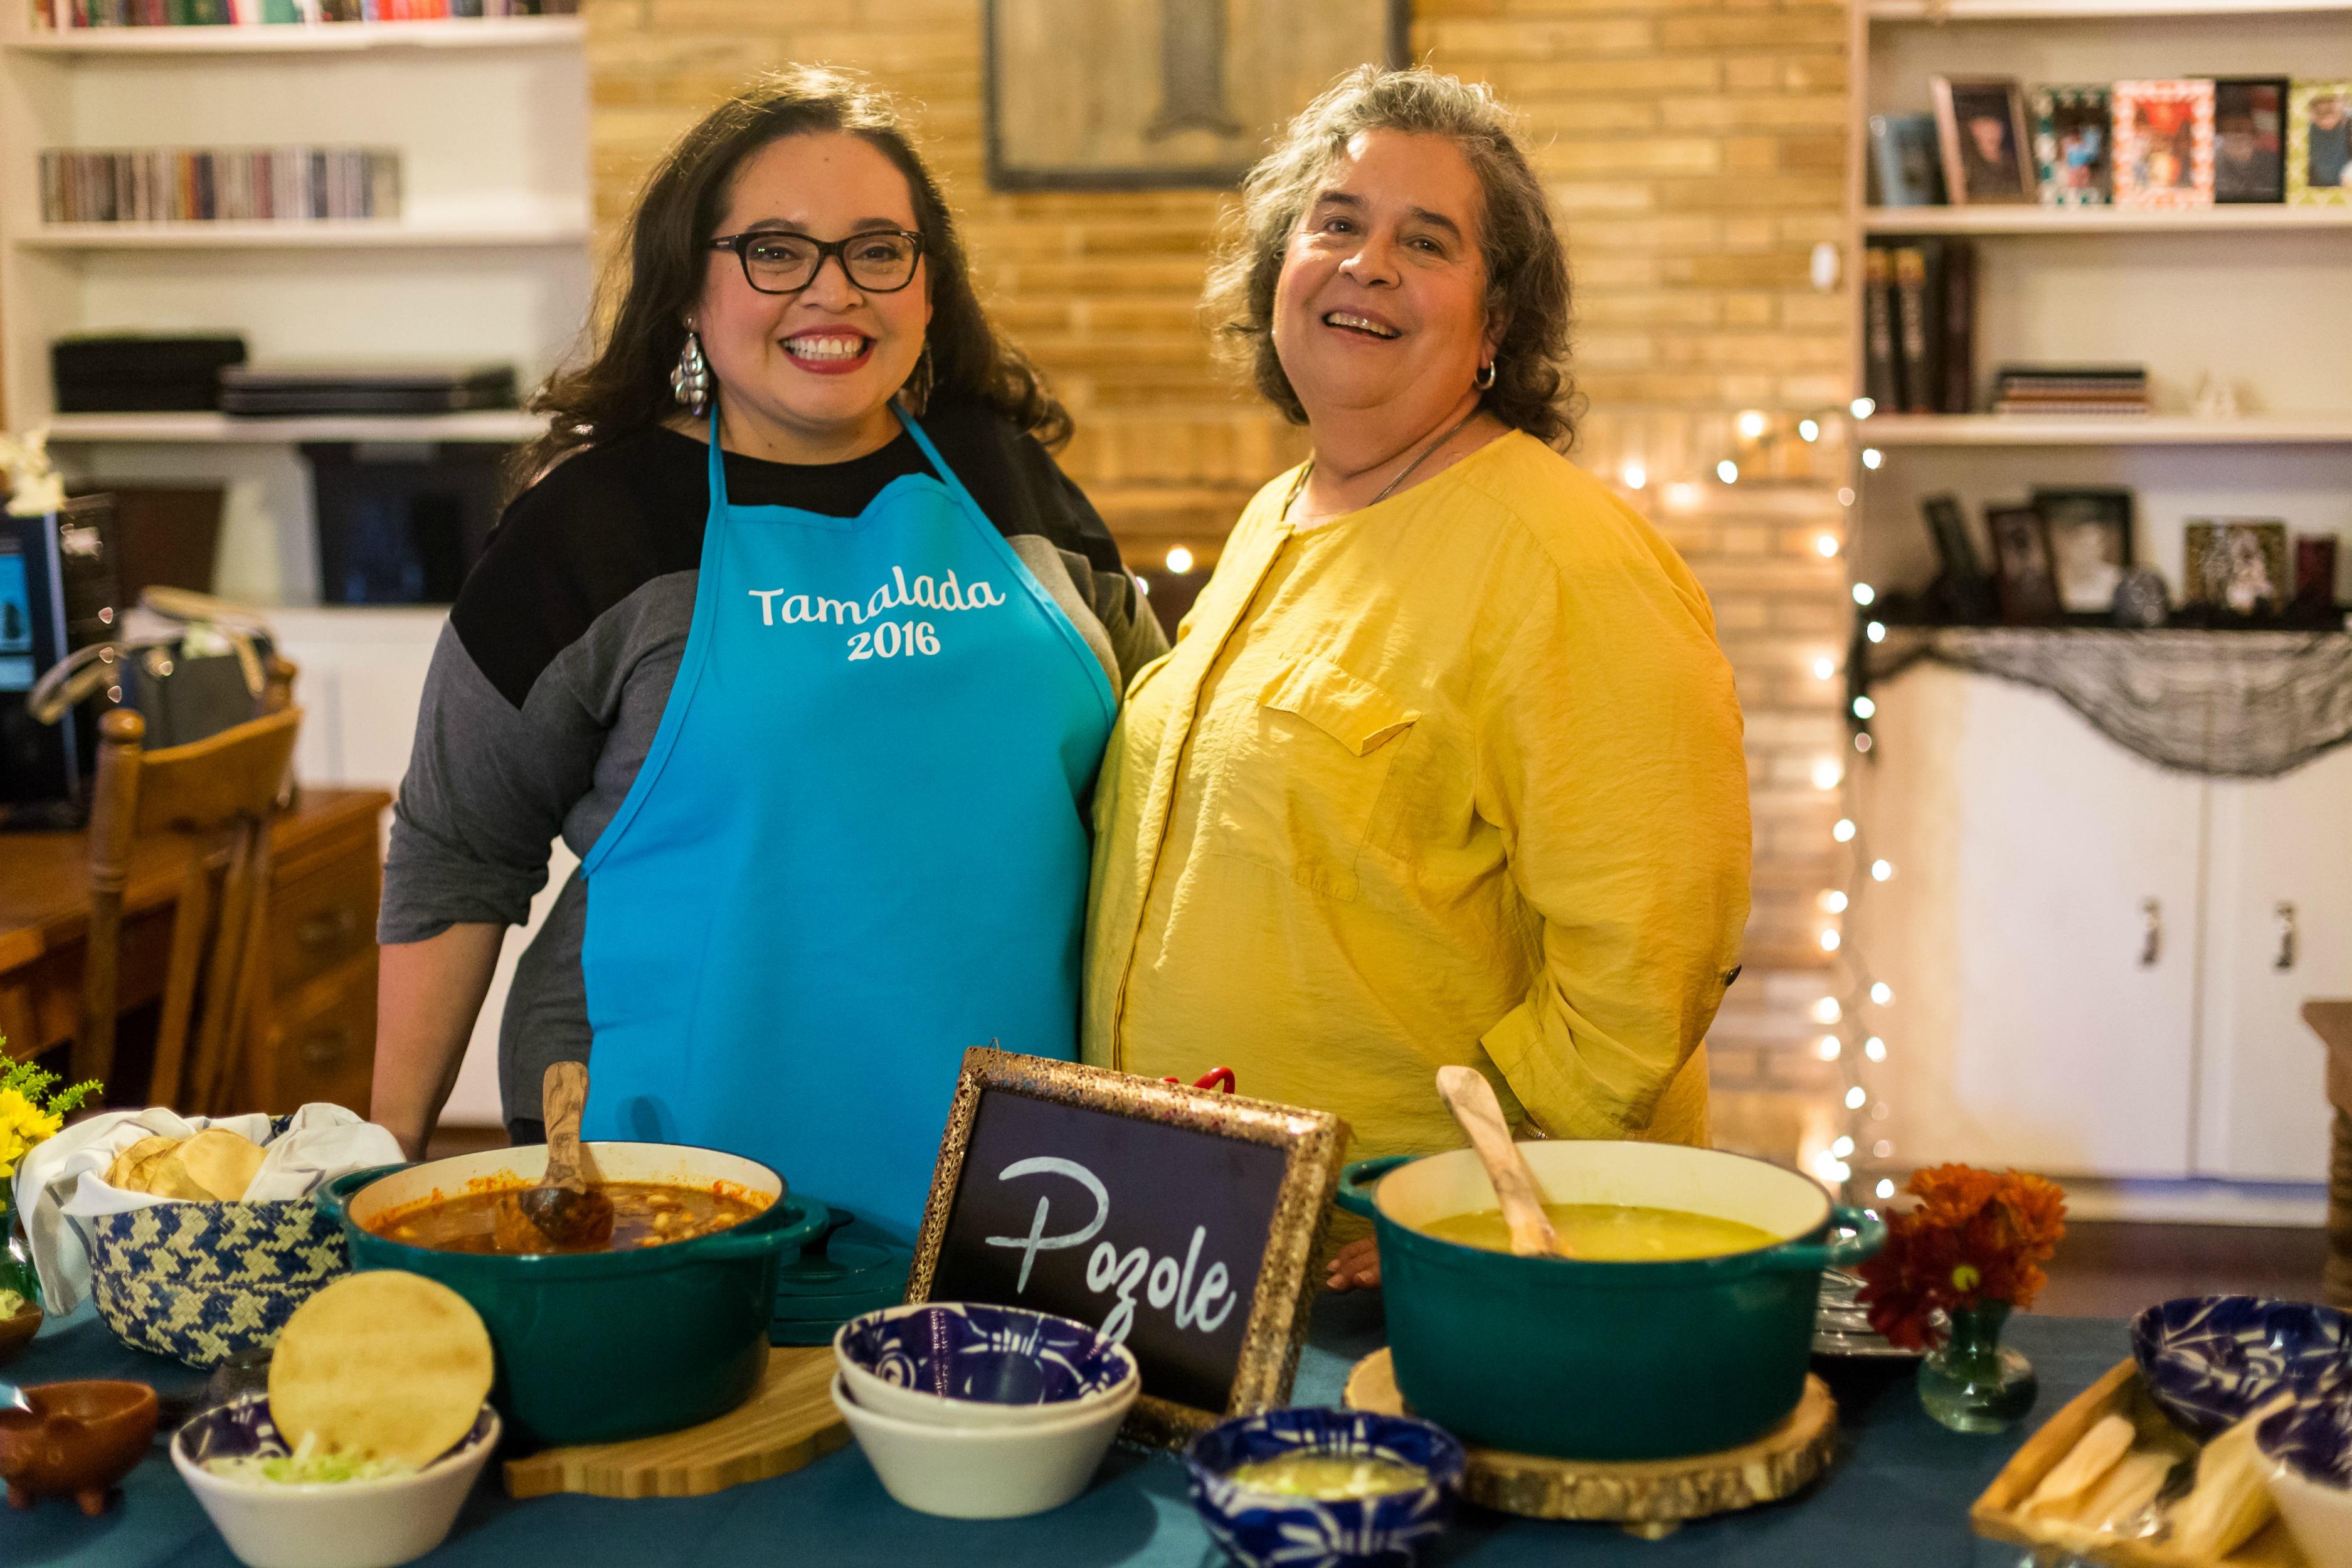 how-to-host-a-tamalada-pozole-family-recipes-vianneyrodriguez-sweetlifebake